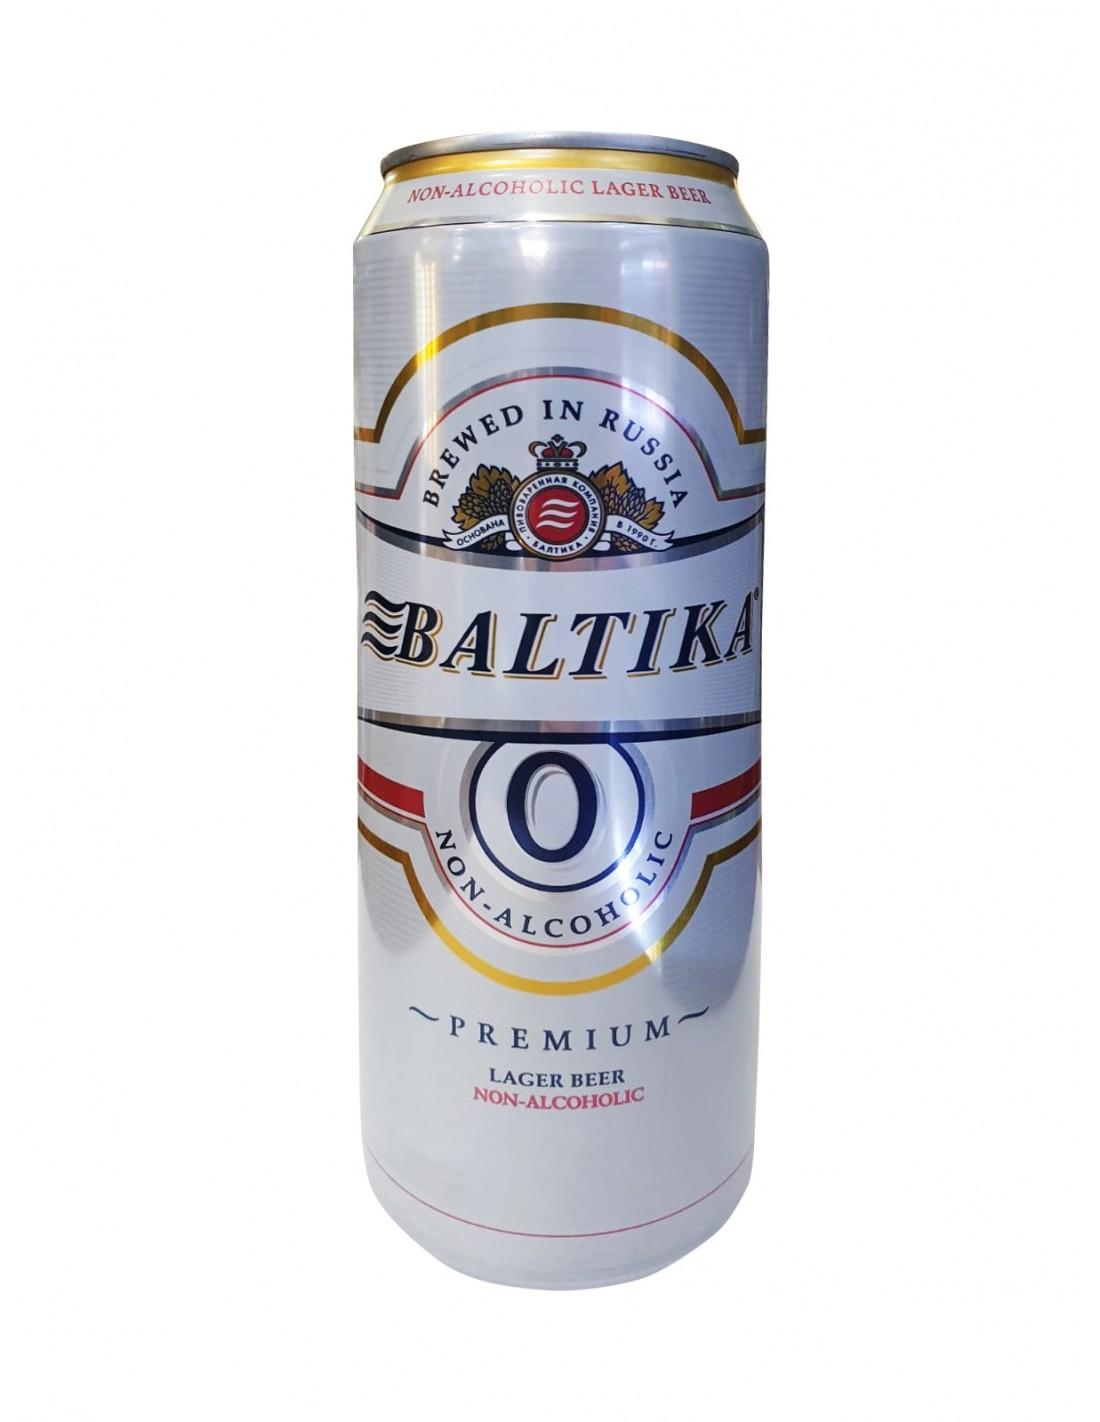 Bere blonda fara alcool Baltika, 0% alc., 0.45L, Rusia